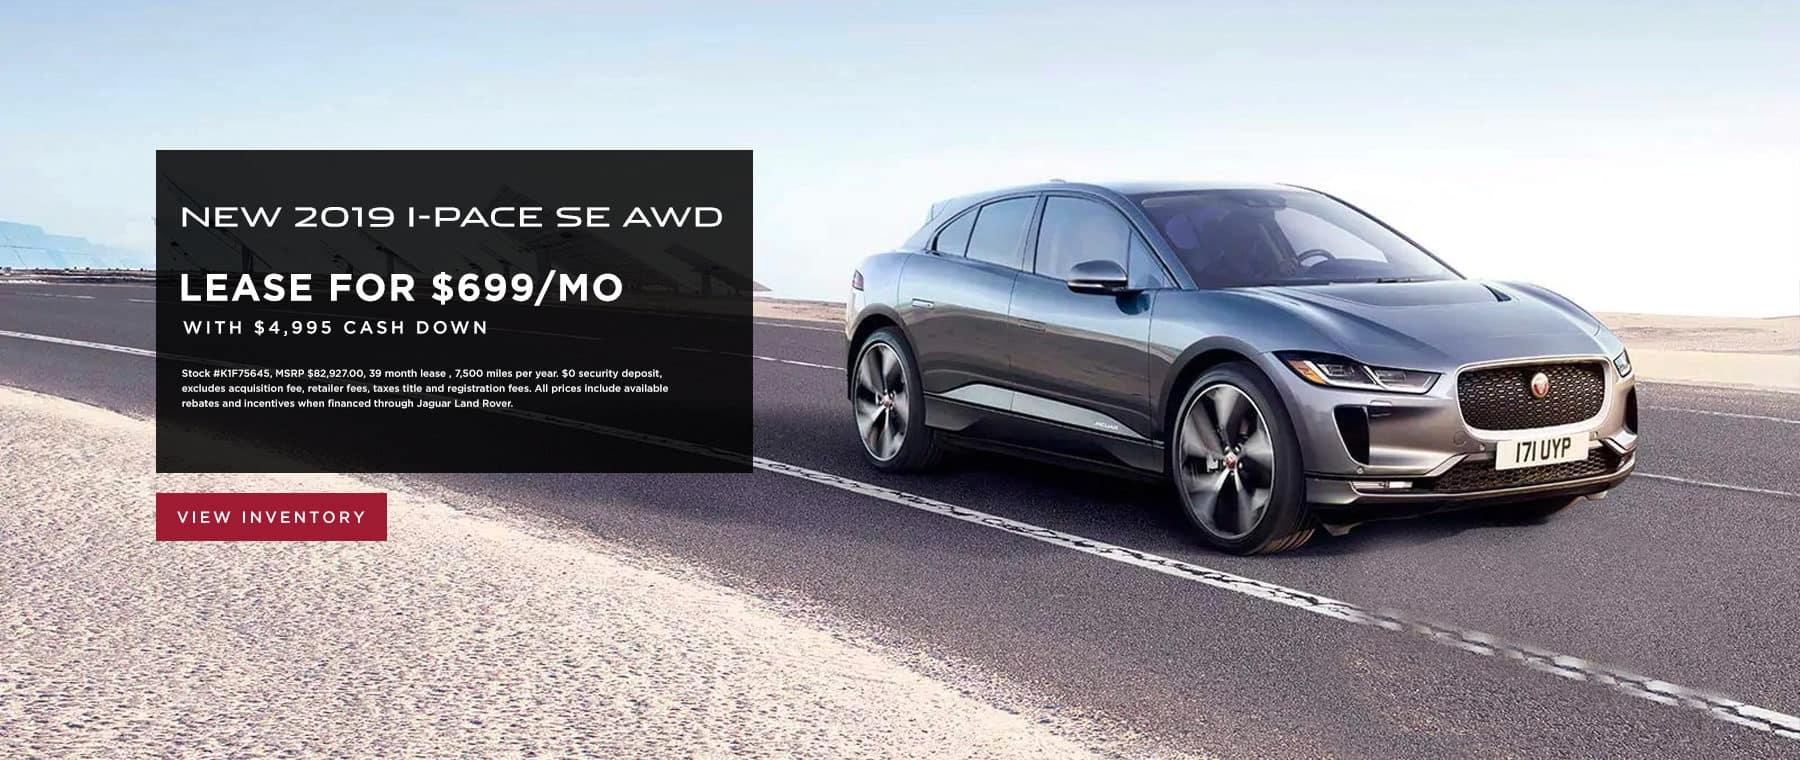 2019 I-PACE SE AWD